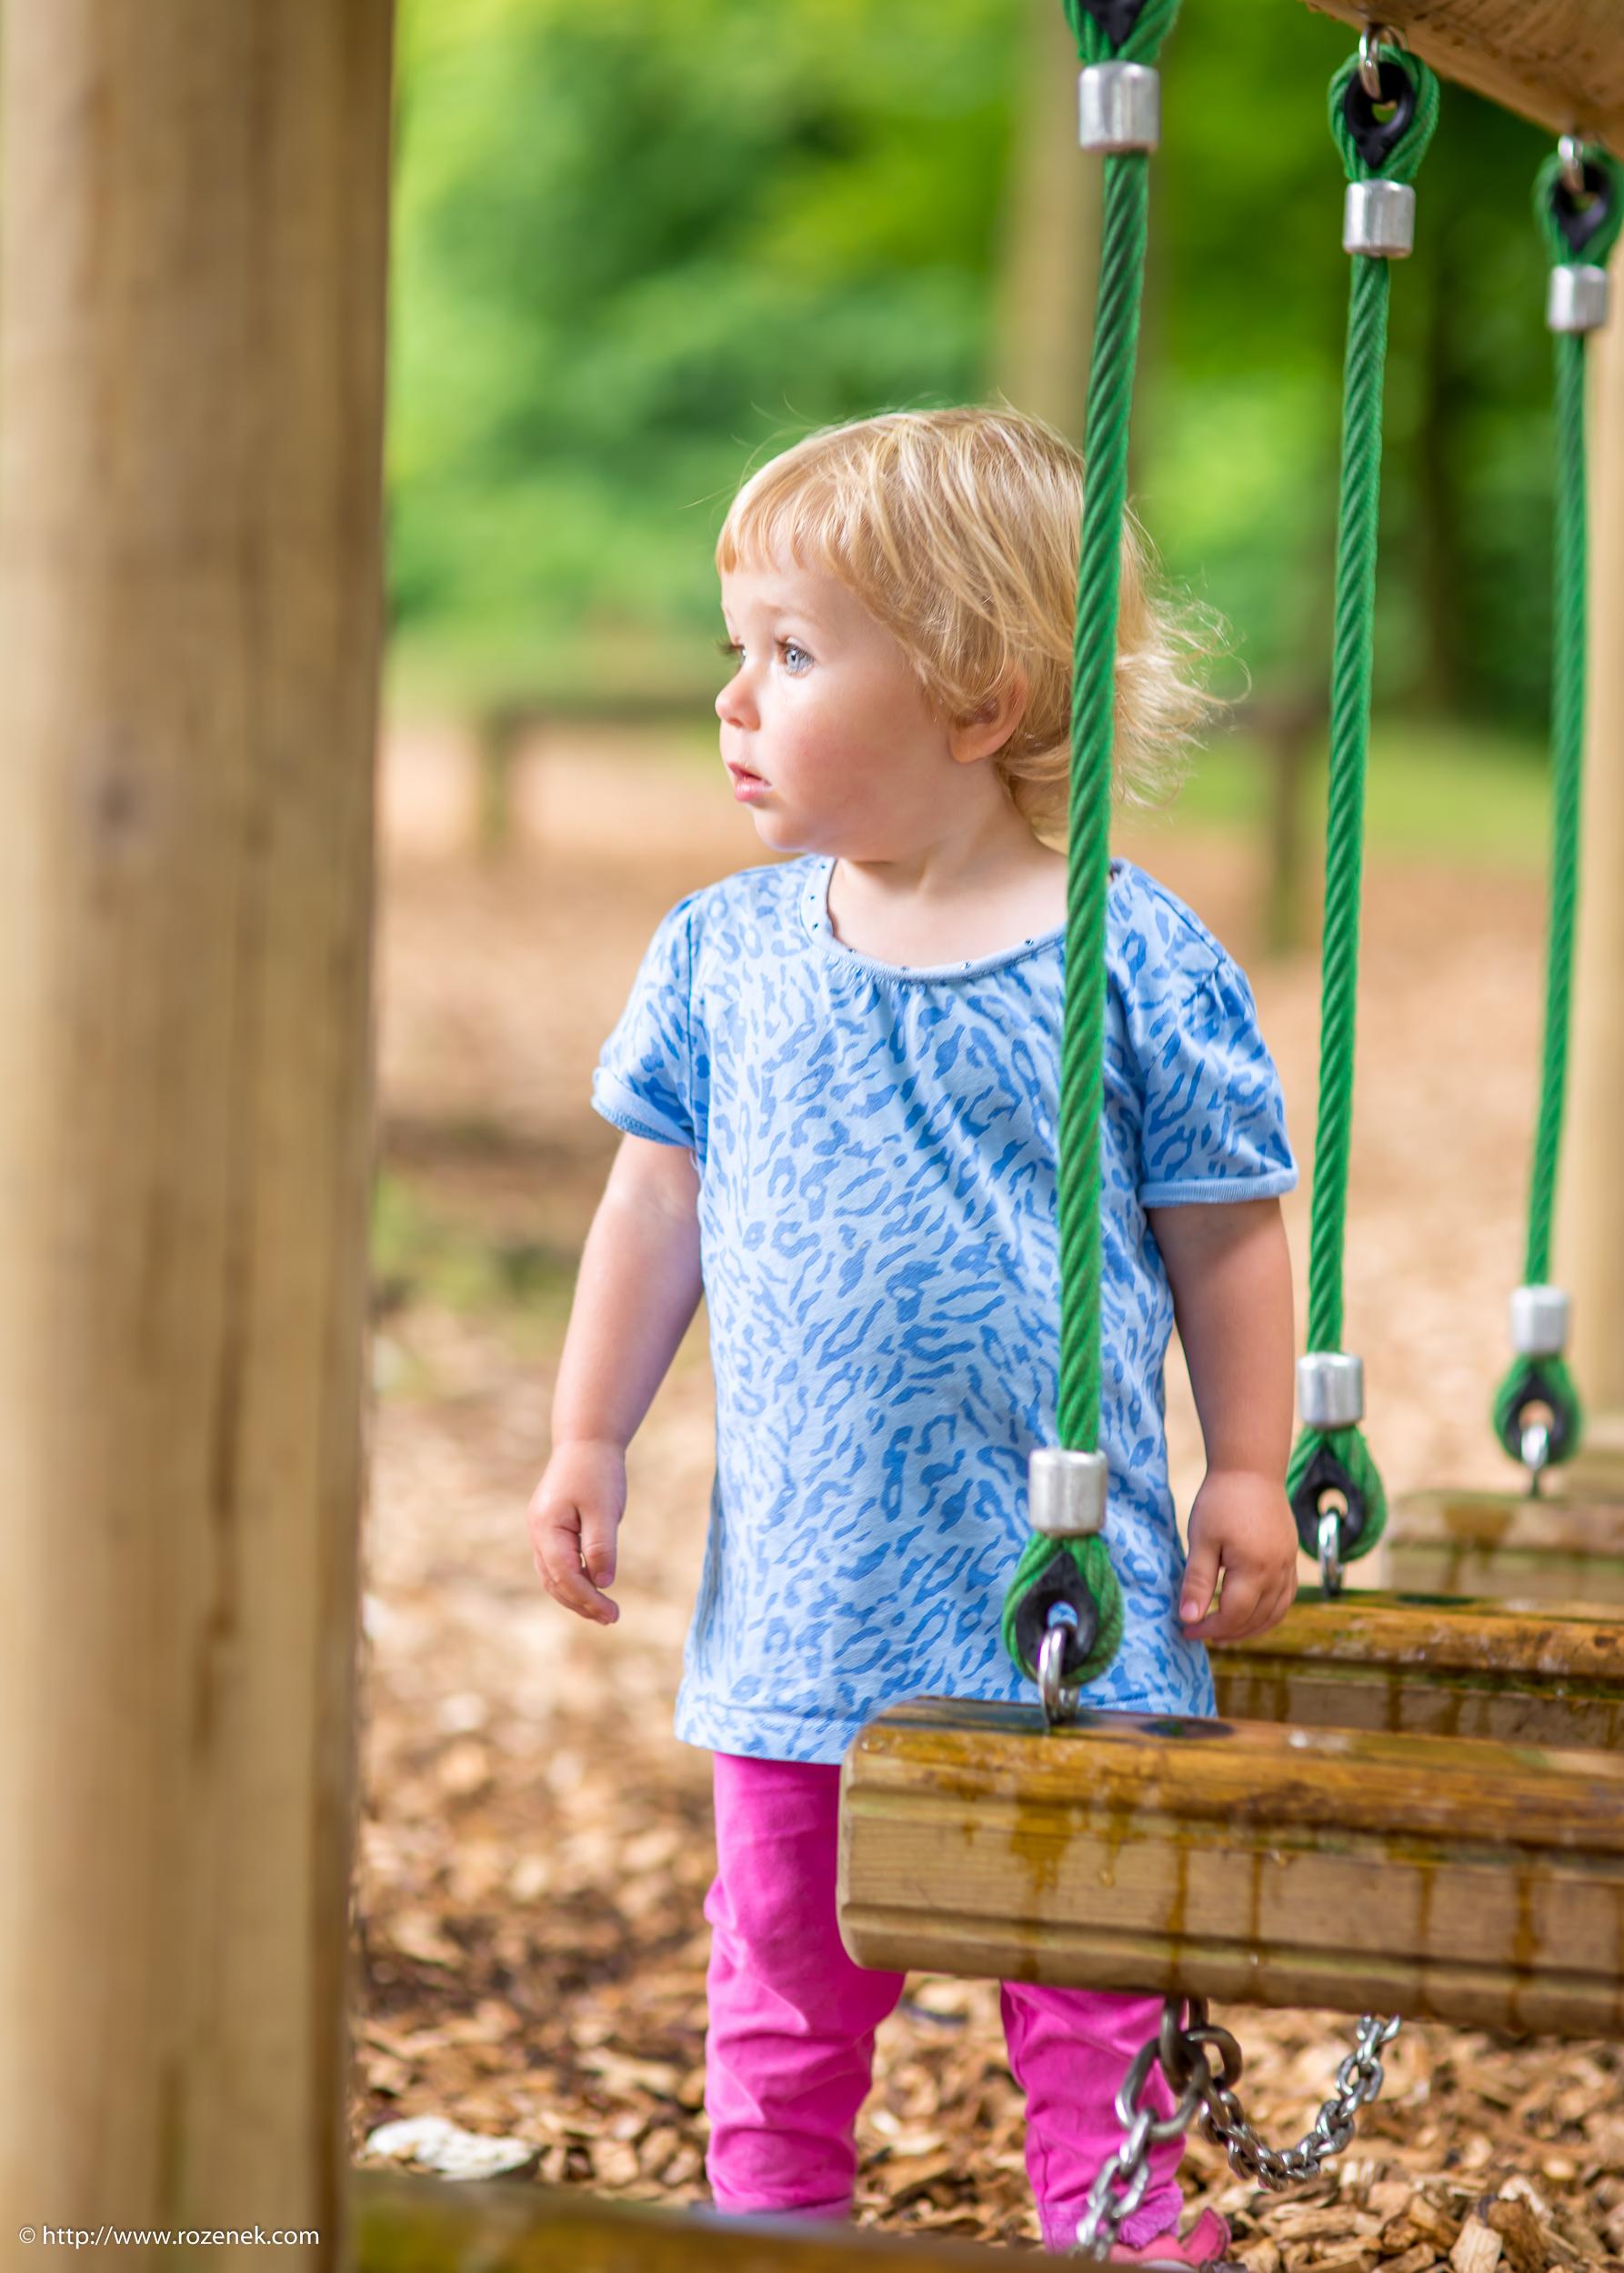 2016.08.05 - Karina at Queen Elizabeth Country Park - 05